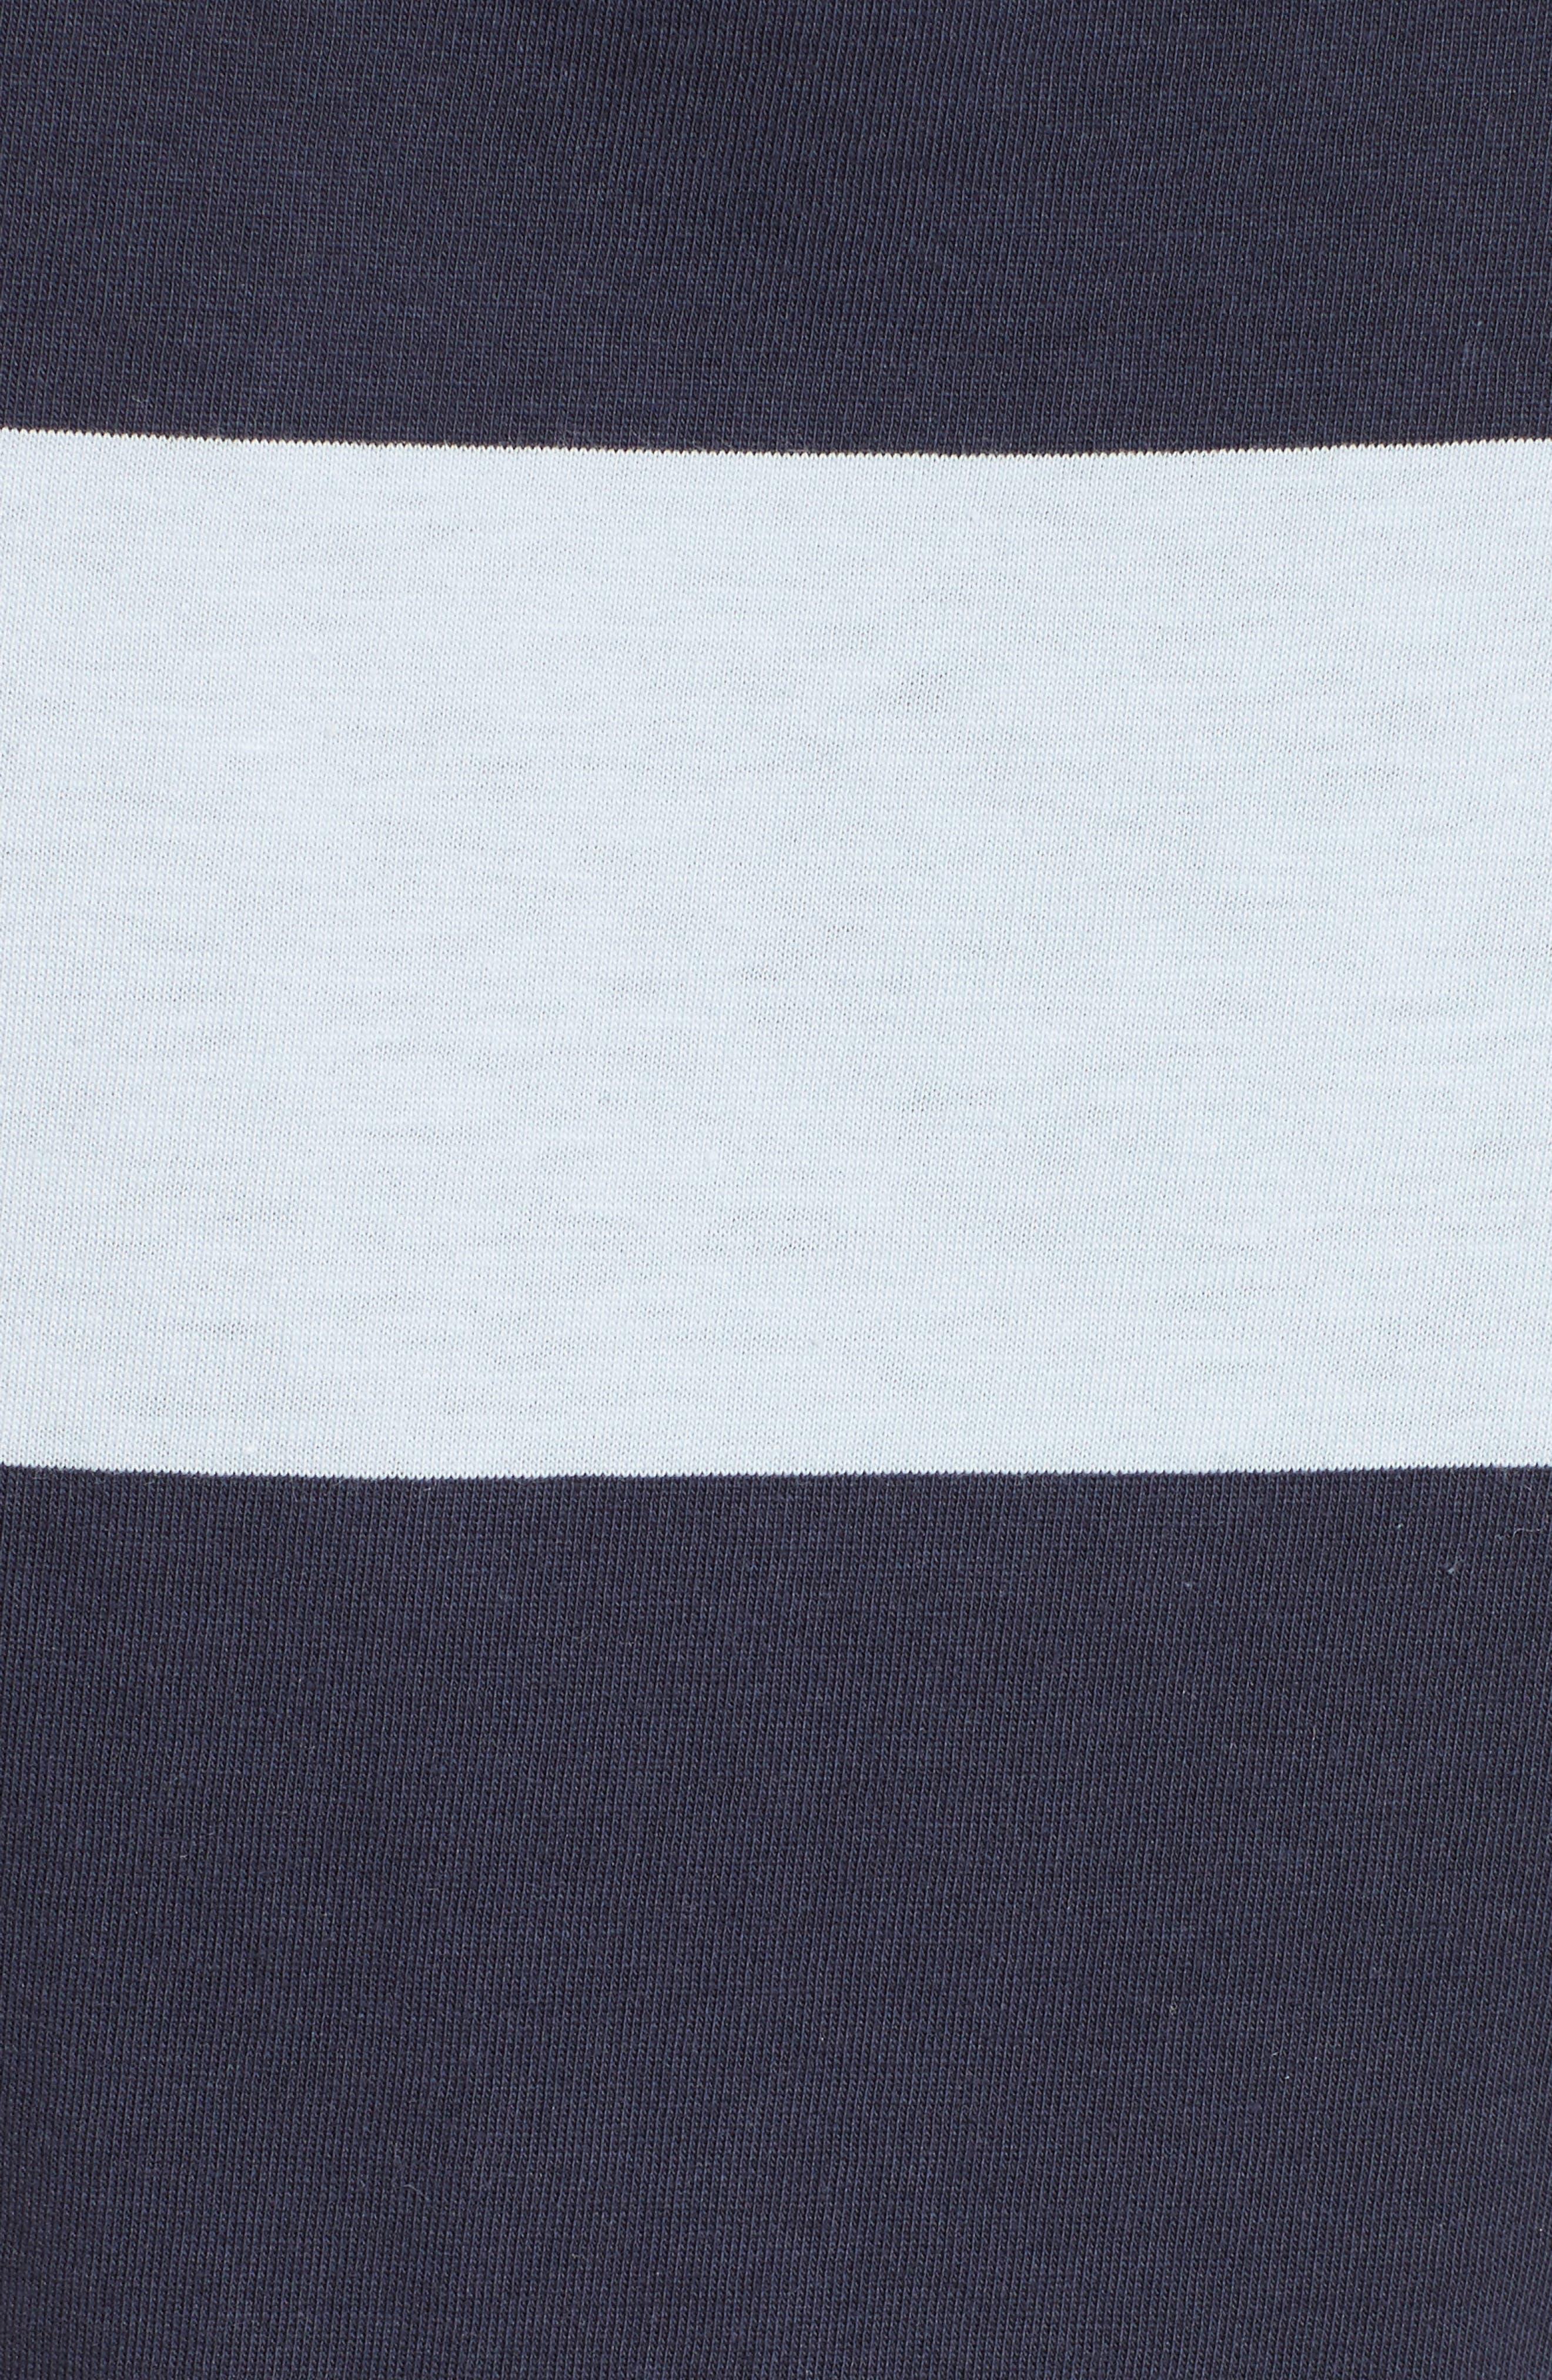 Alternate Image 3  - ATM Anthony Thomas Melillo Stripe Mercerized Jersey Dress